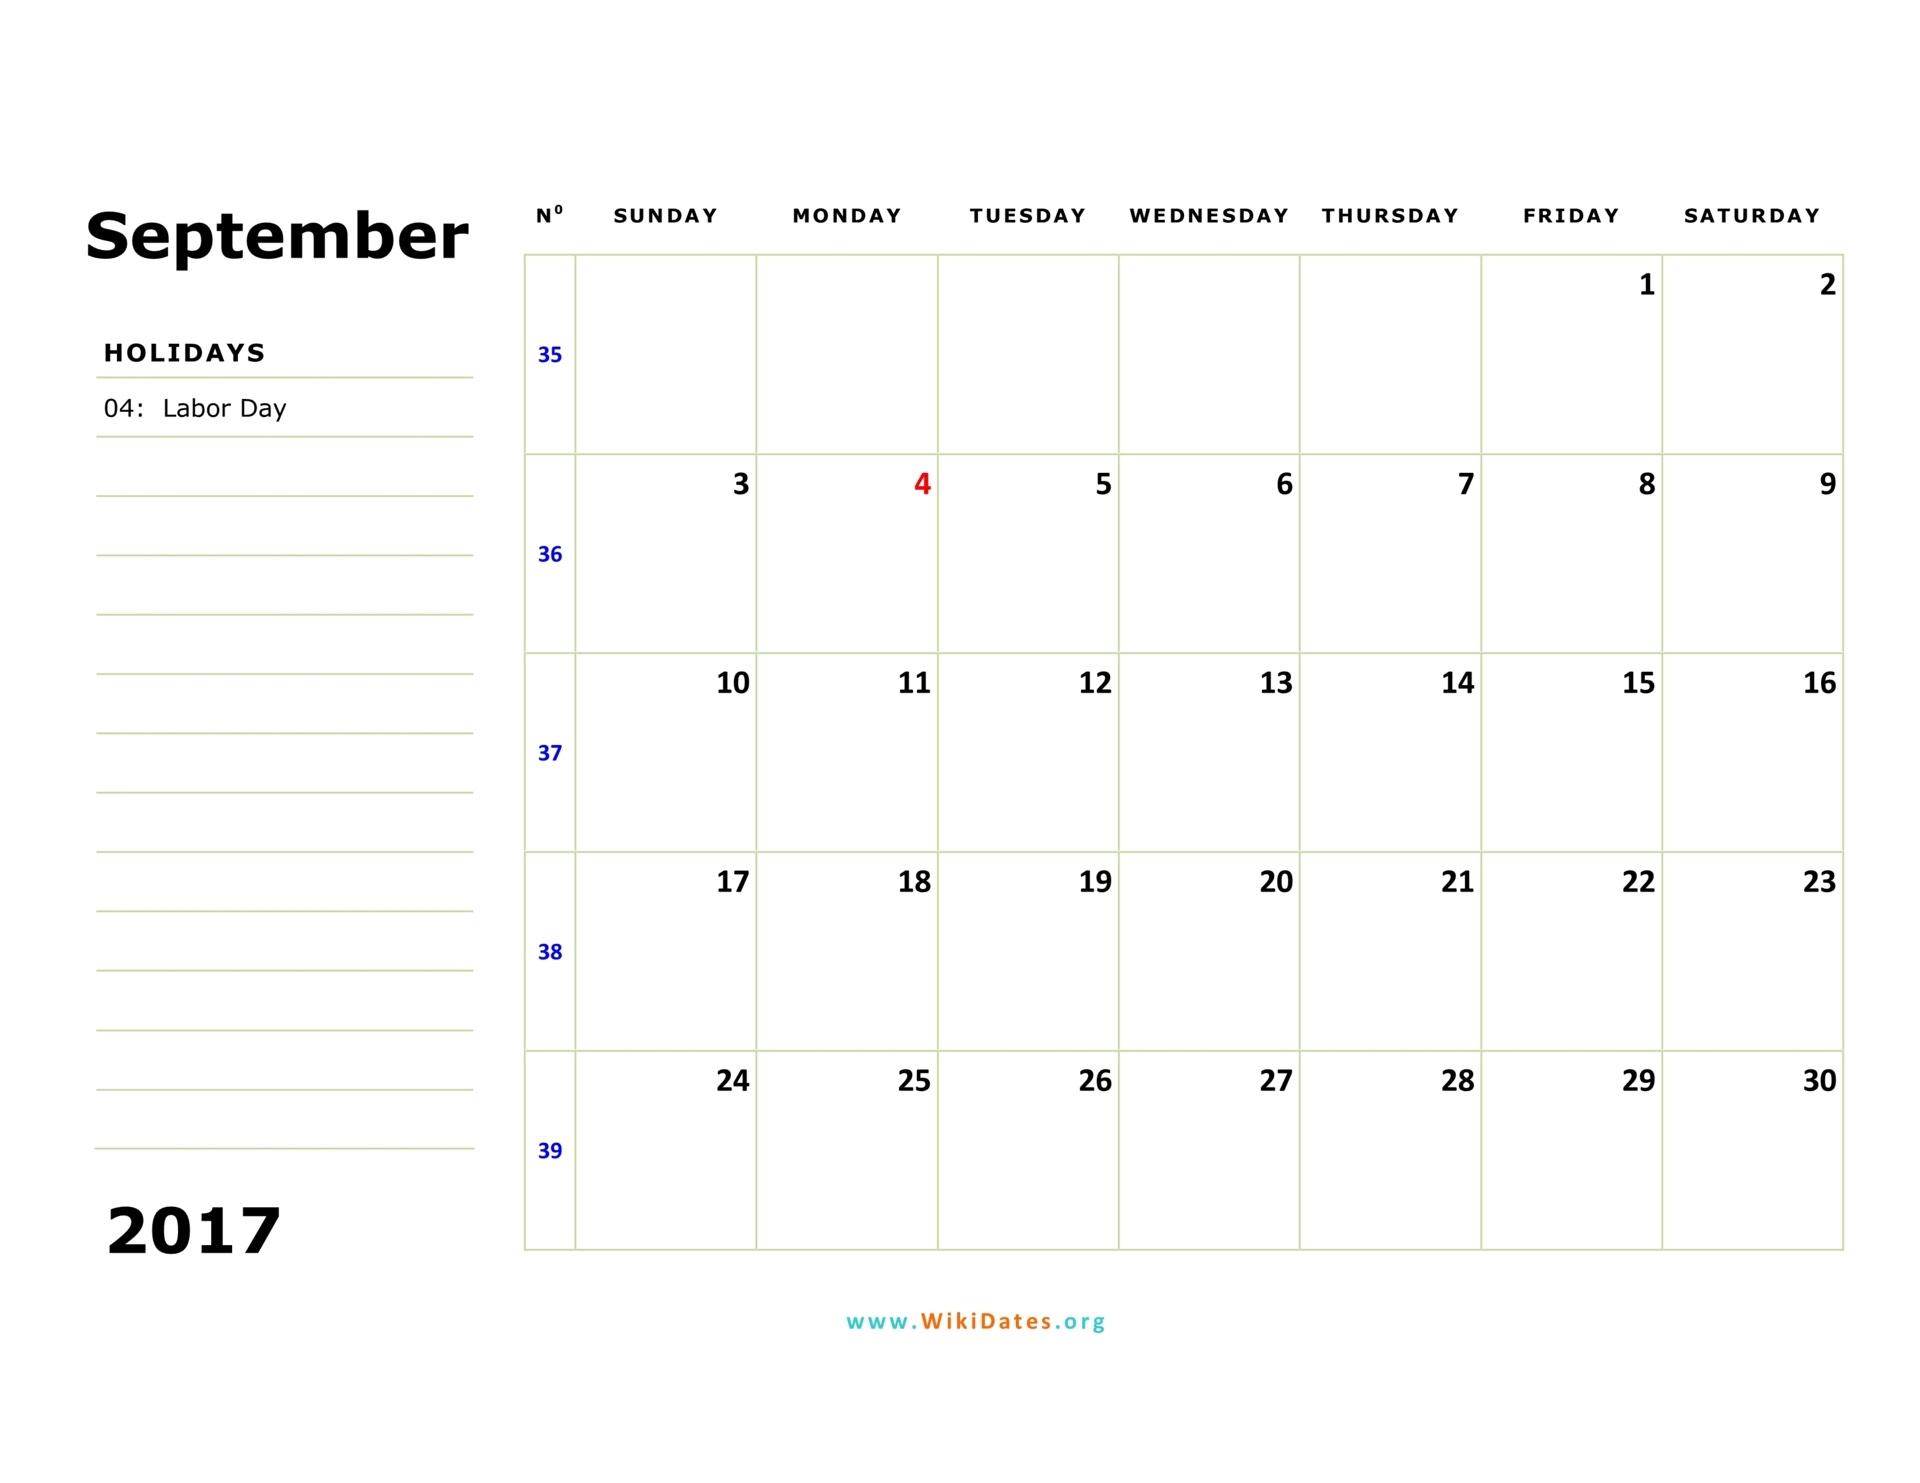 September 2017 Calendar  WikiDates.org